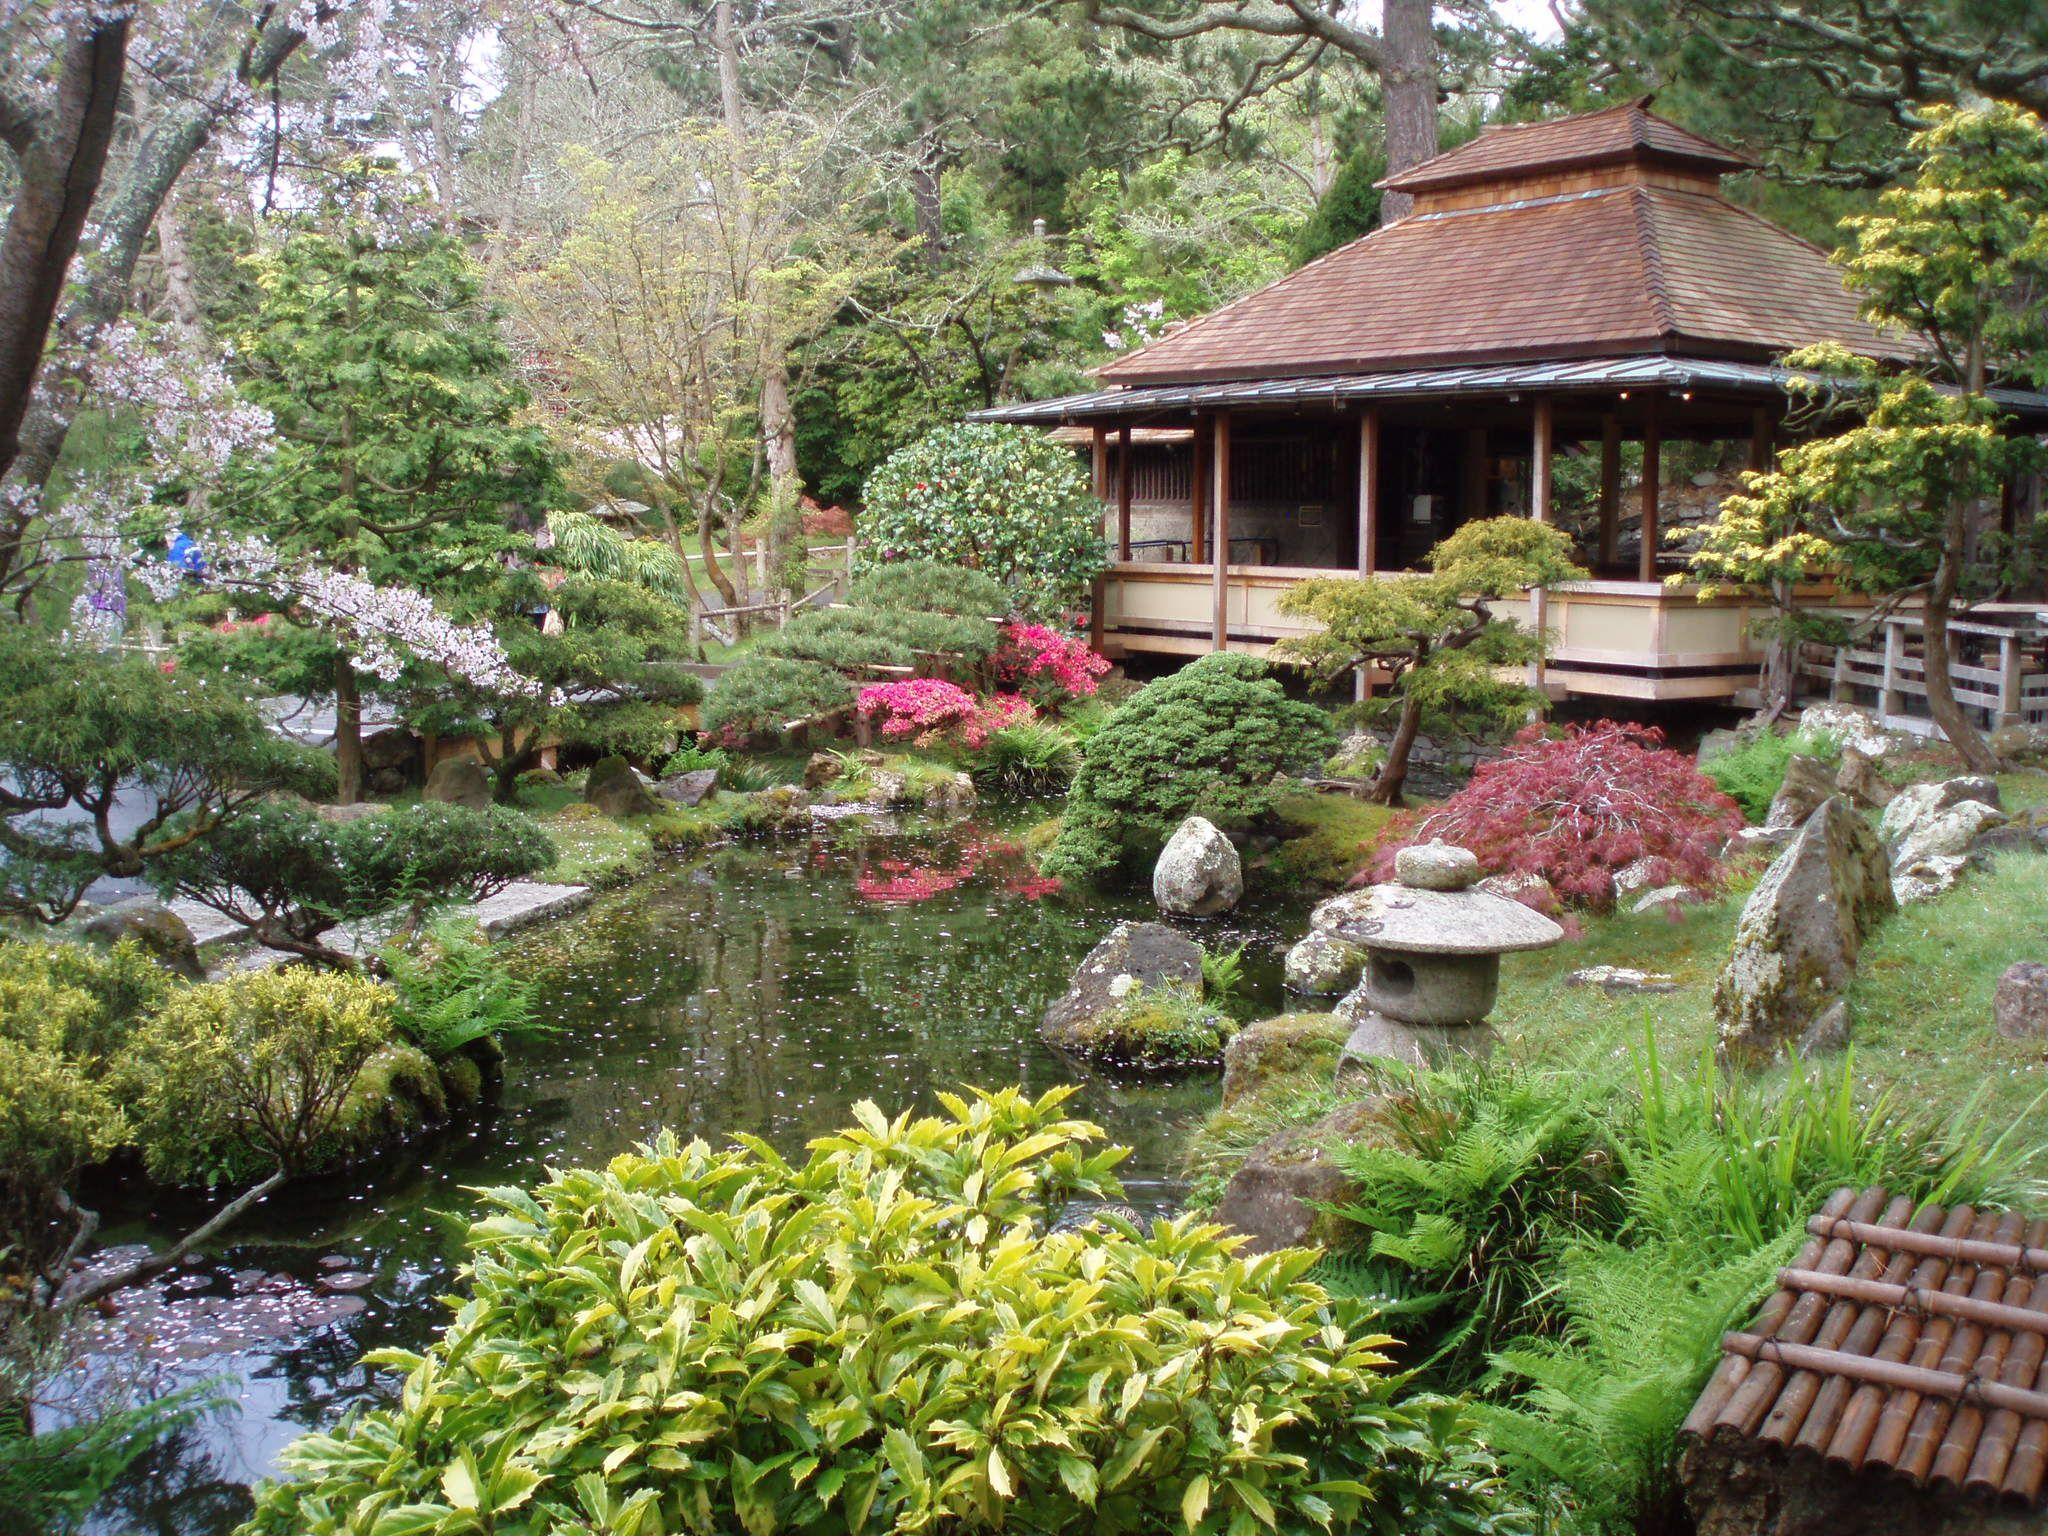 ac3f395e234dbaad7019e73461074a1e - Things To Do In Tea Gardens